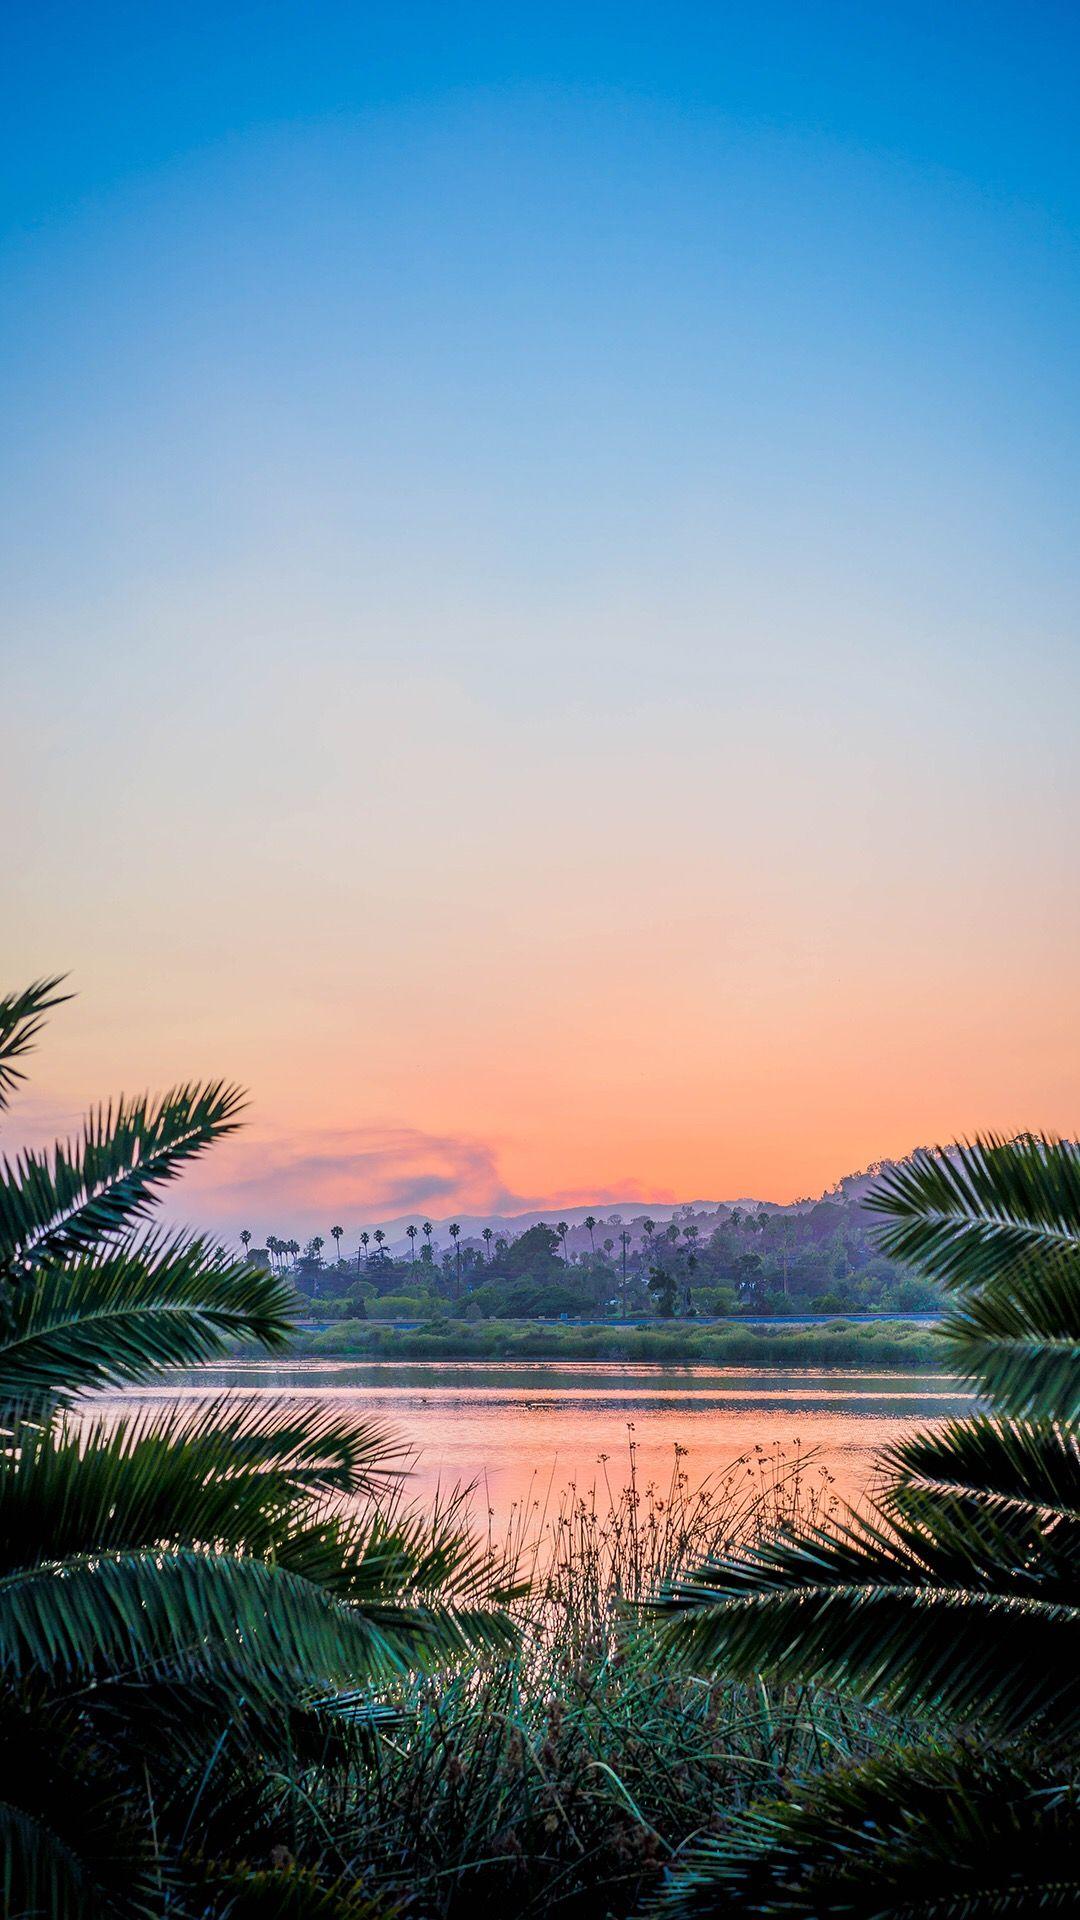 Sunset Iphone Wallpaper Paysage Fond D Ecran Telephone Nature Paysage